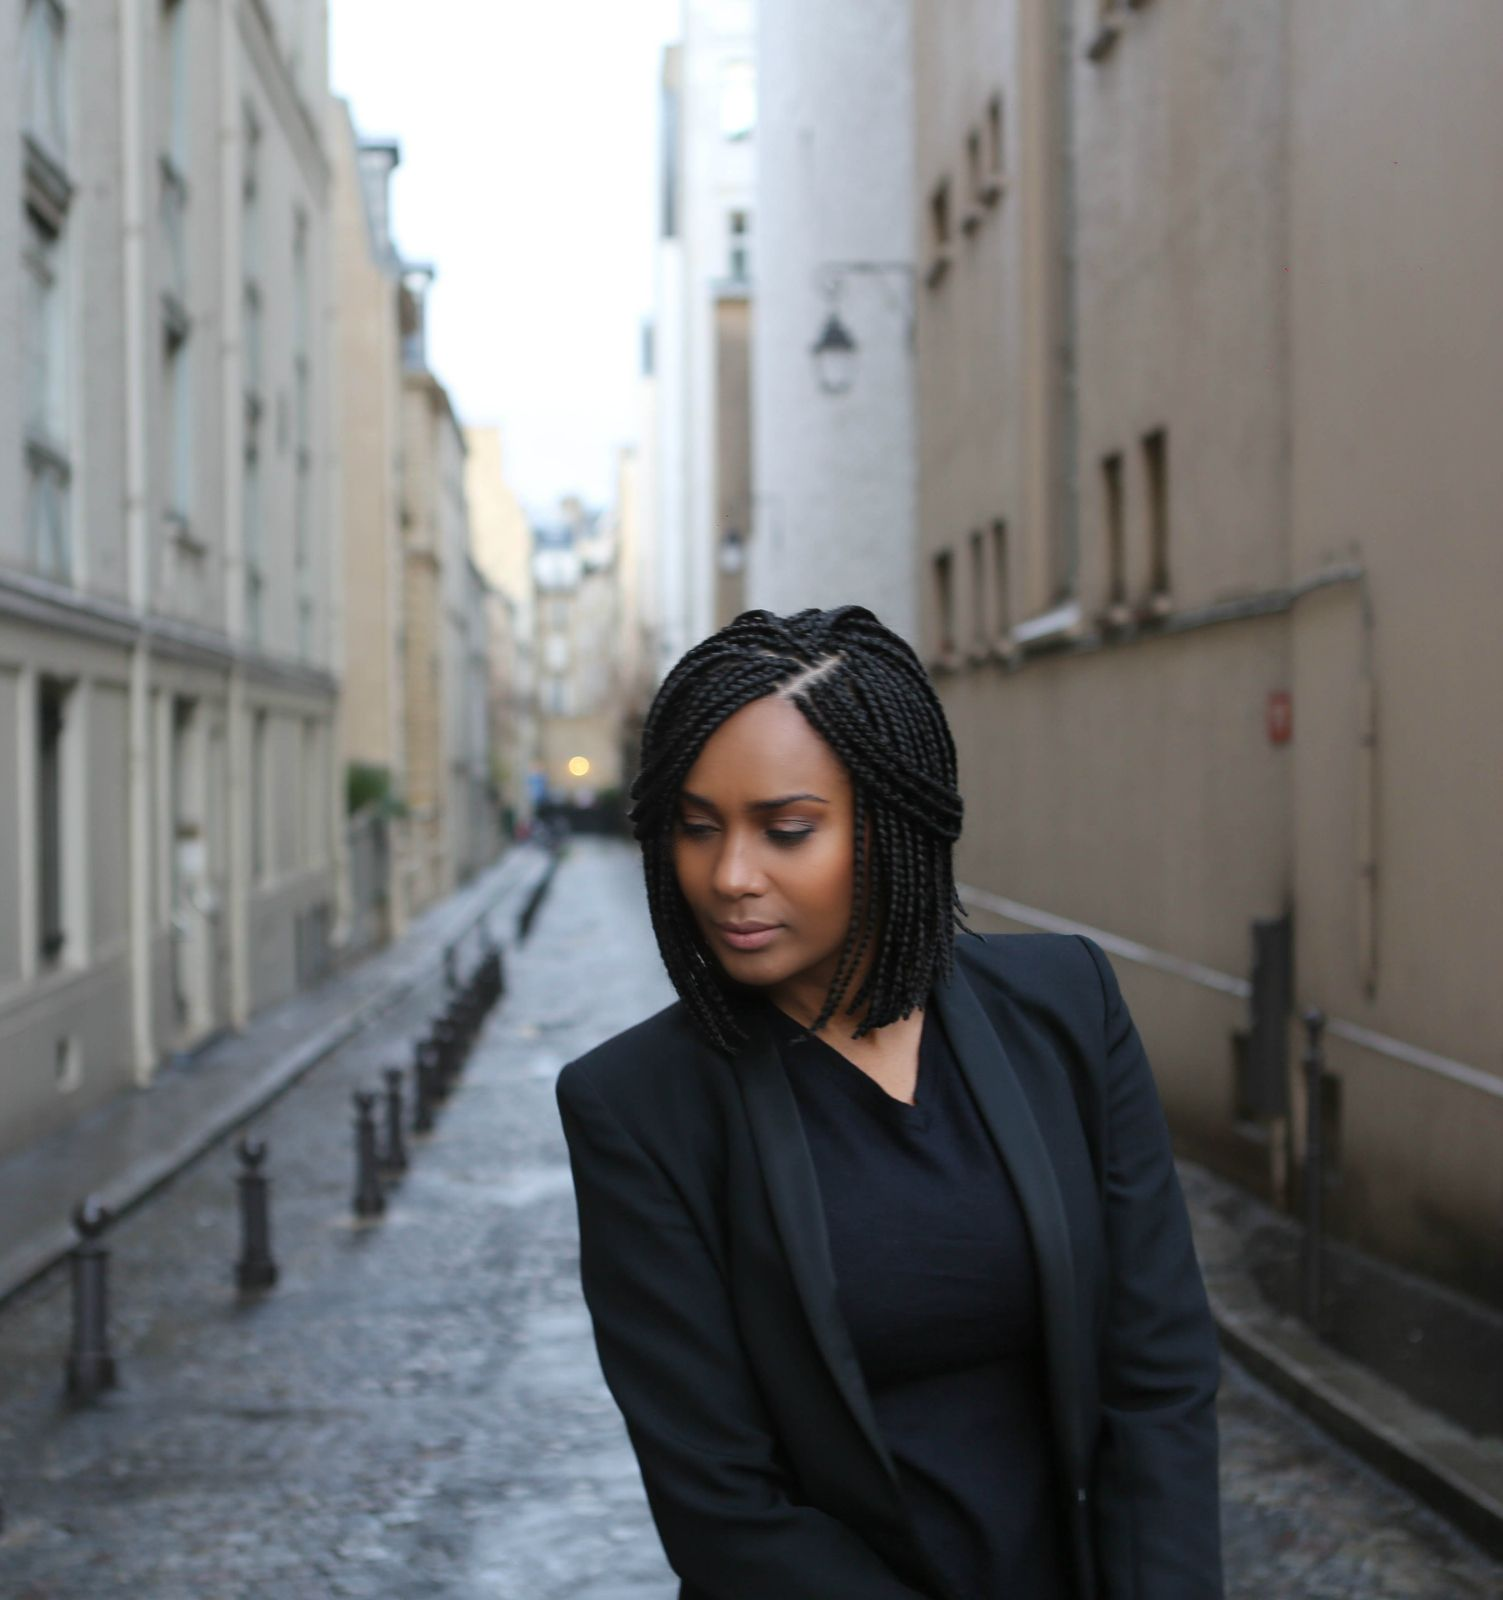 Tresses africaine avec meches rouge for Salon coiffure afro paris